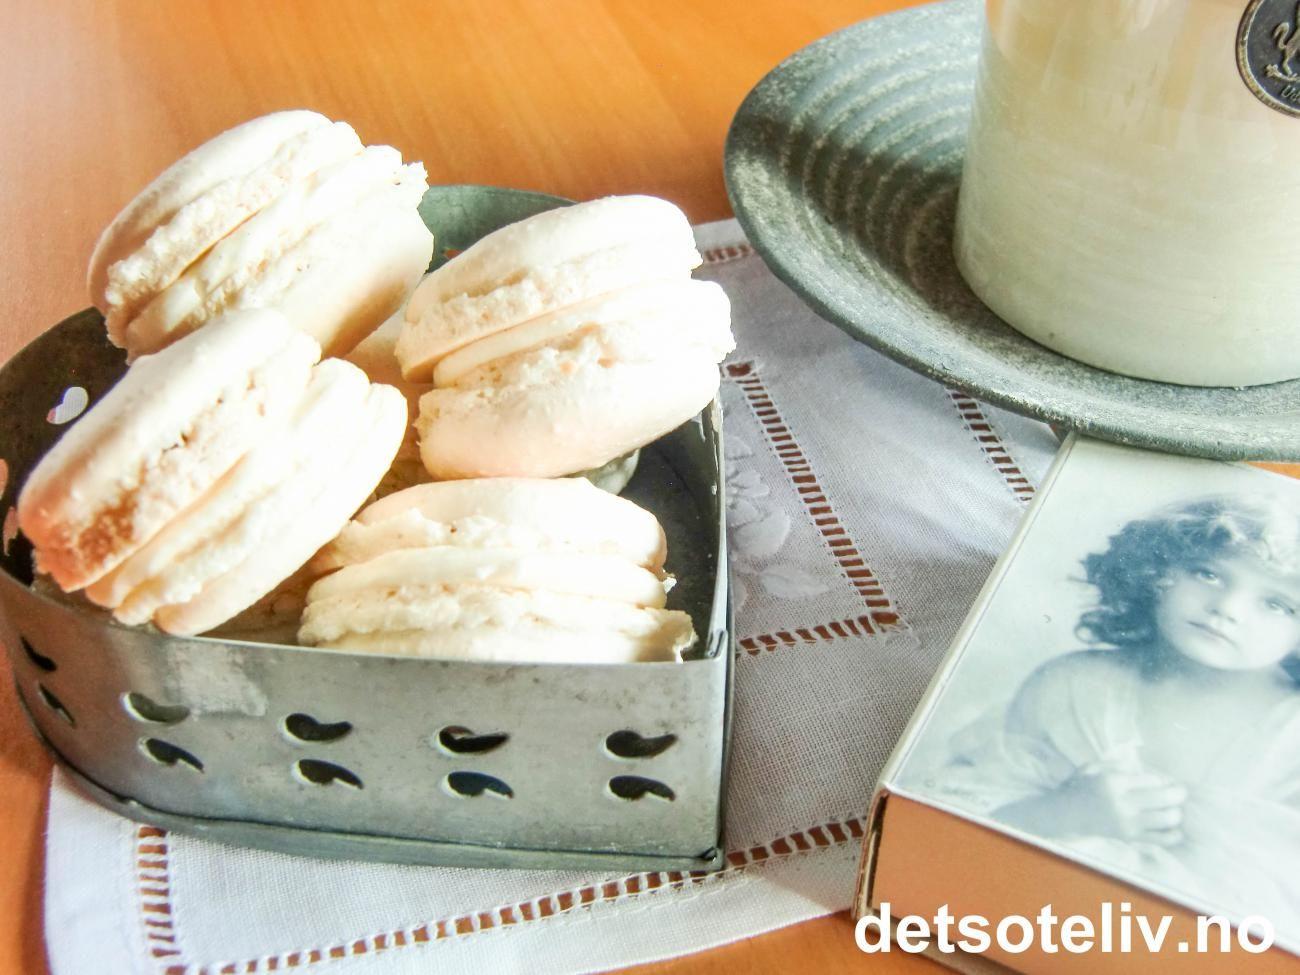 Vanilla Macarons | Det søte liv